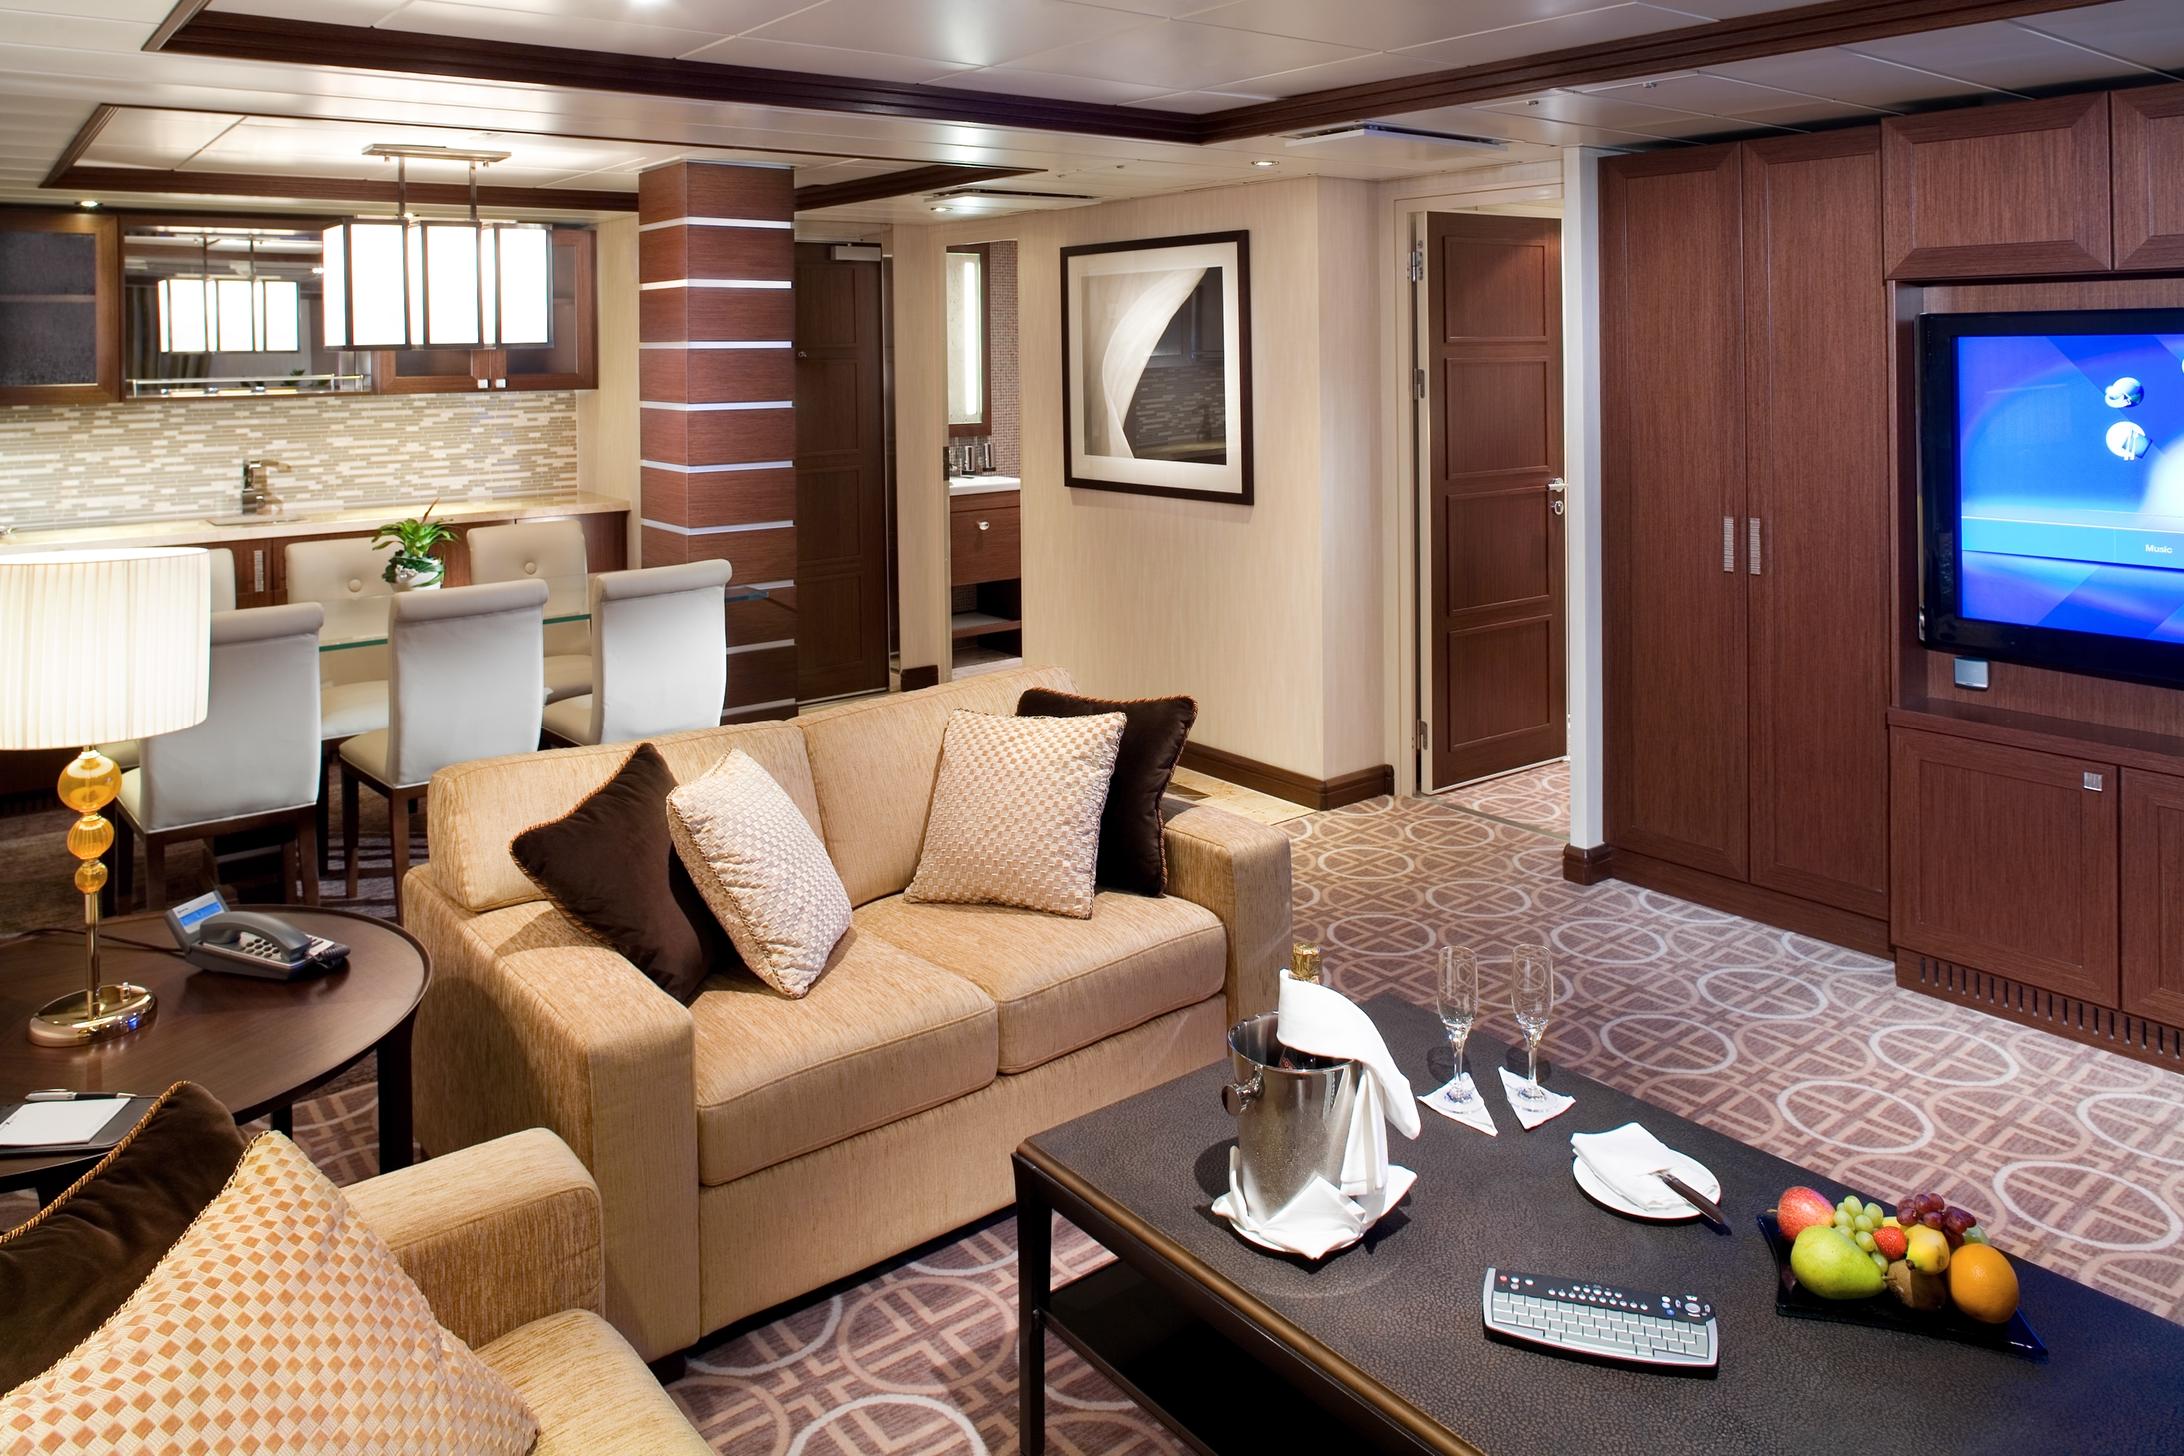 celebrity cruises celebrity solstice royal suite.jpg